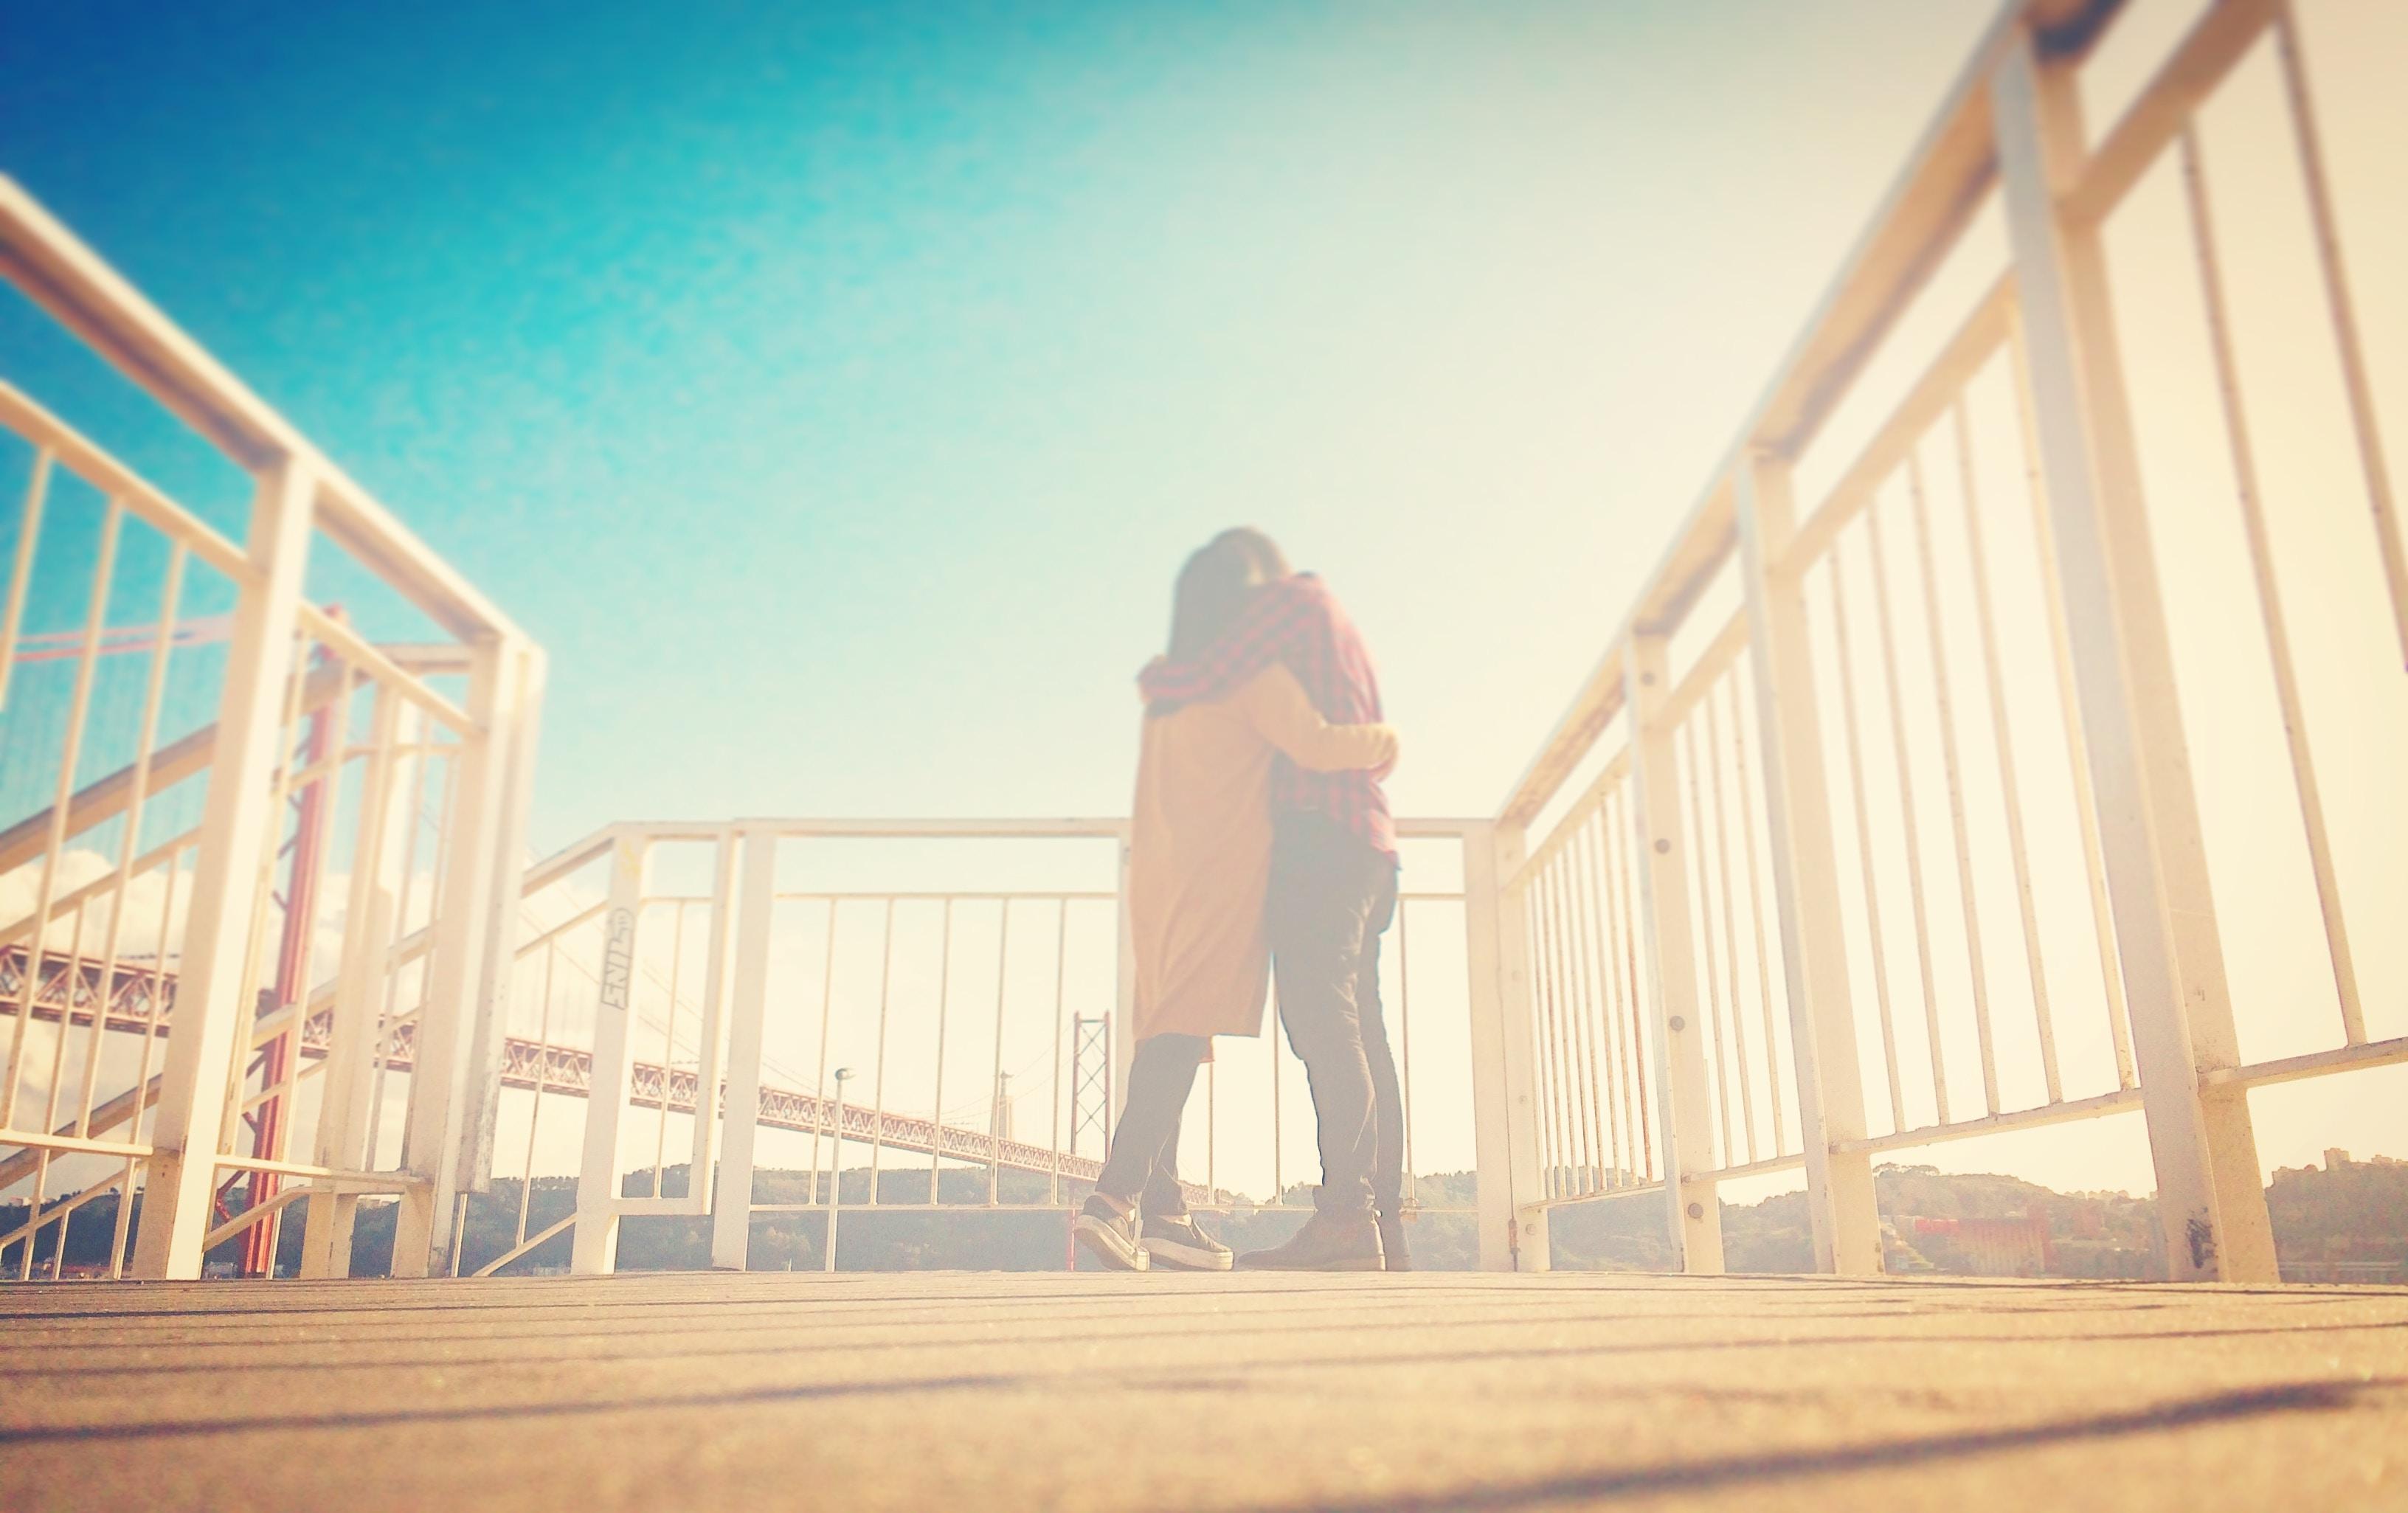 Soft light surrounds lovers on a boardwalk landing